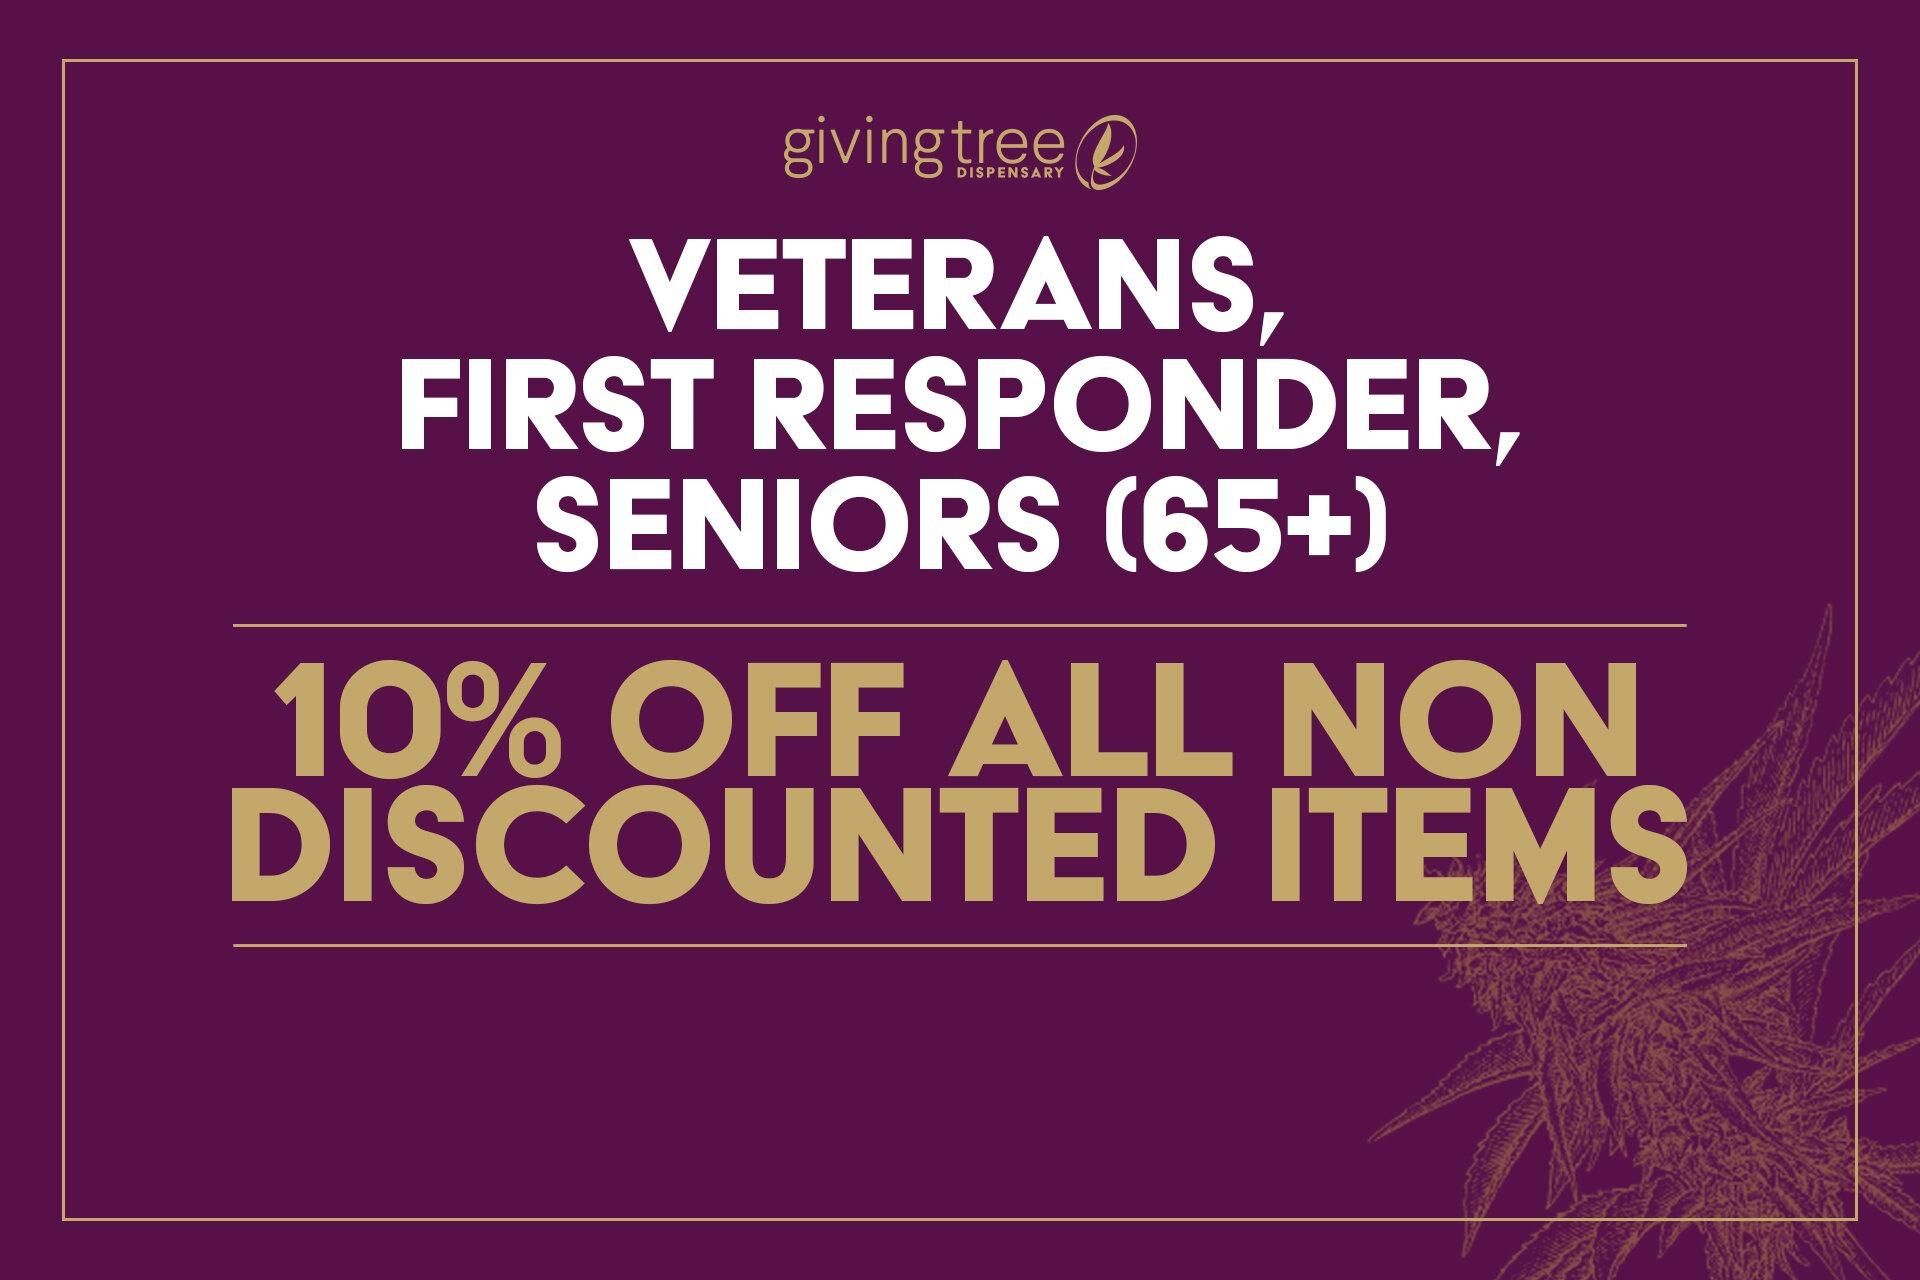 veteran dispensary discounts phoenix givingtreedispensary.com